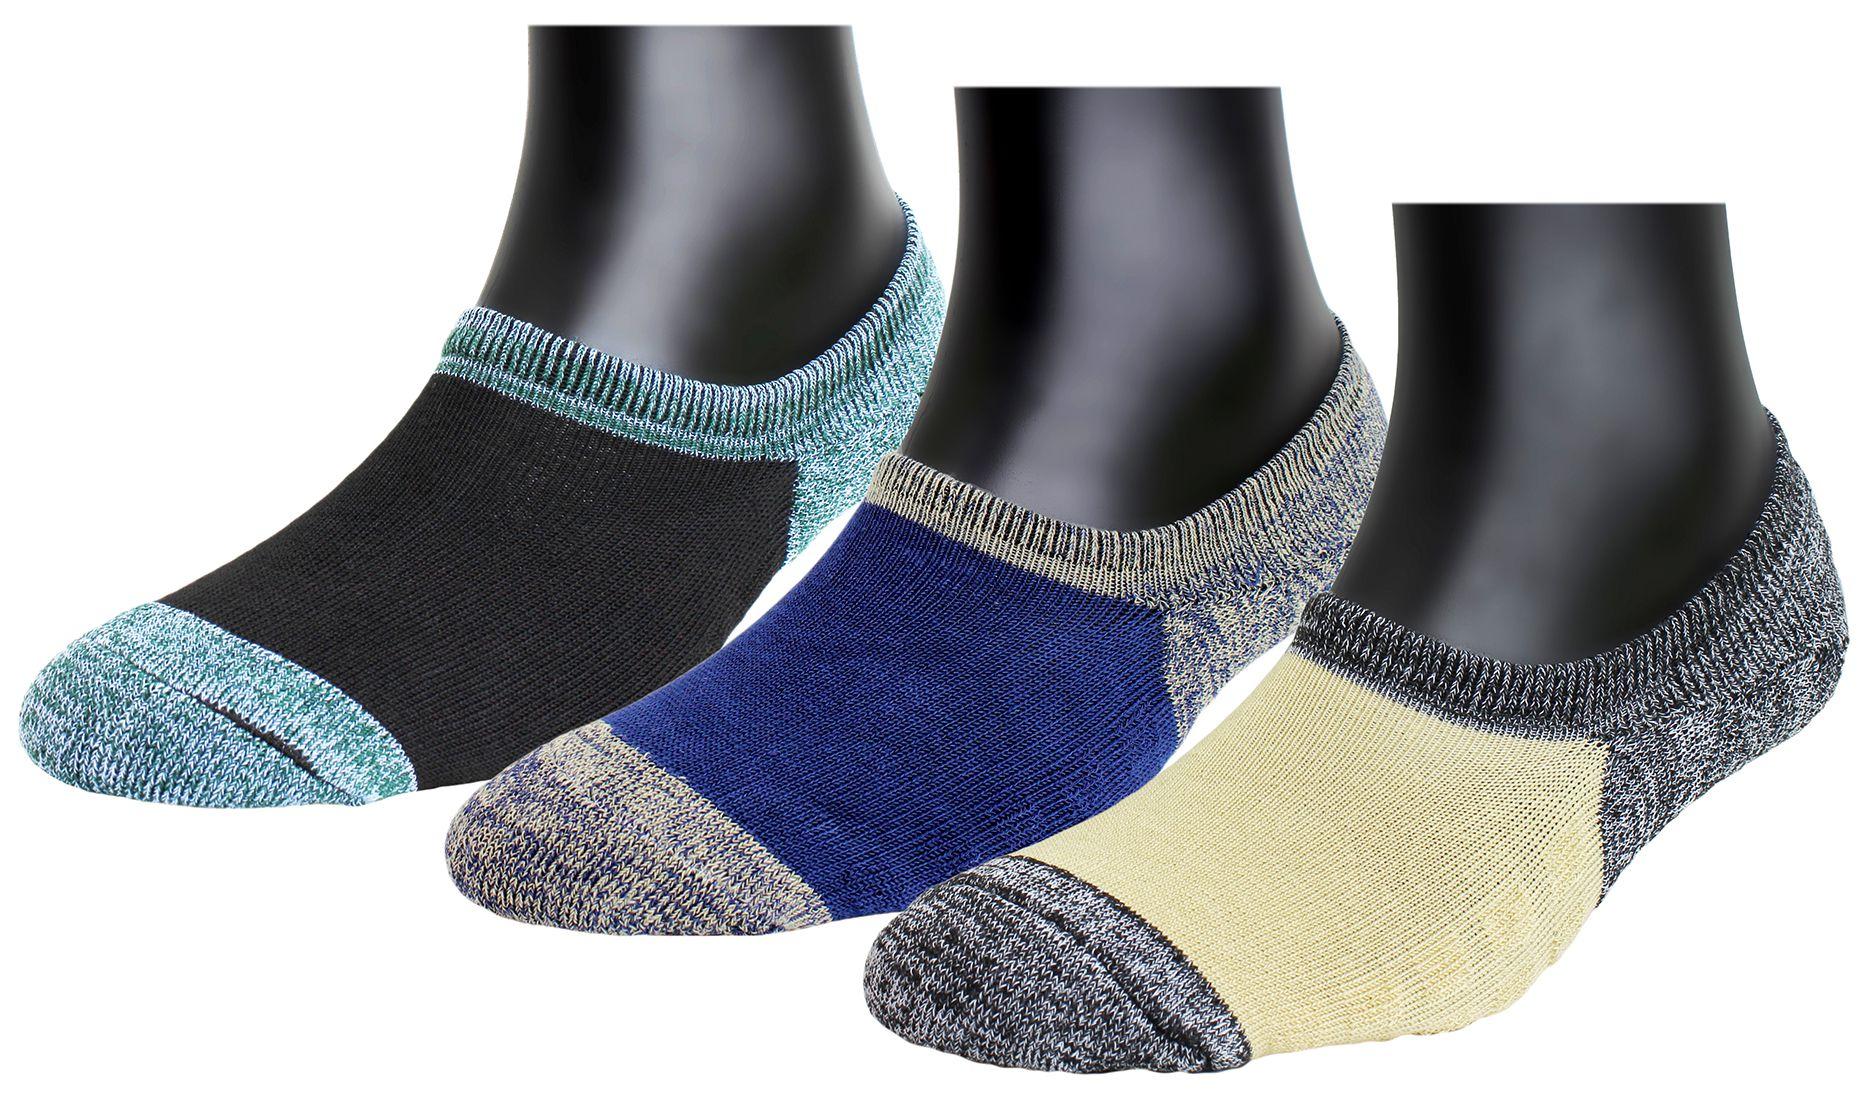 Neska Moda Premium Women's 3 Pairs Terry Cotton Loafer Socks With Silicon Gel Grip-S911